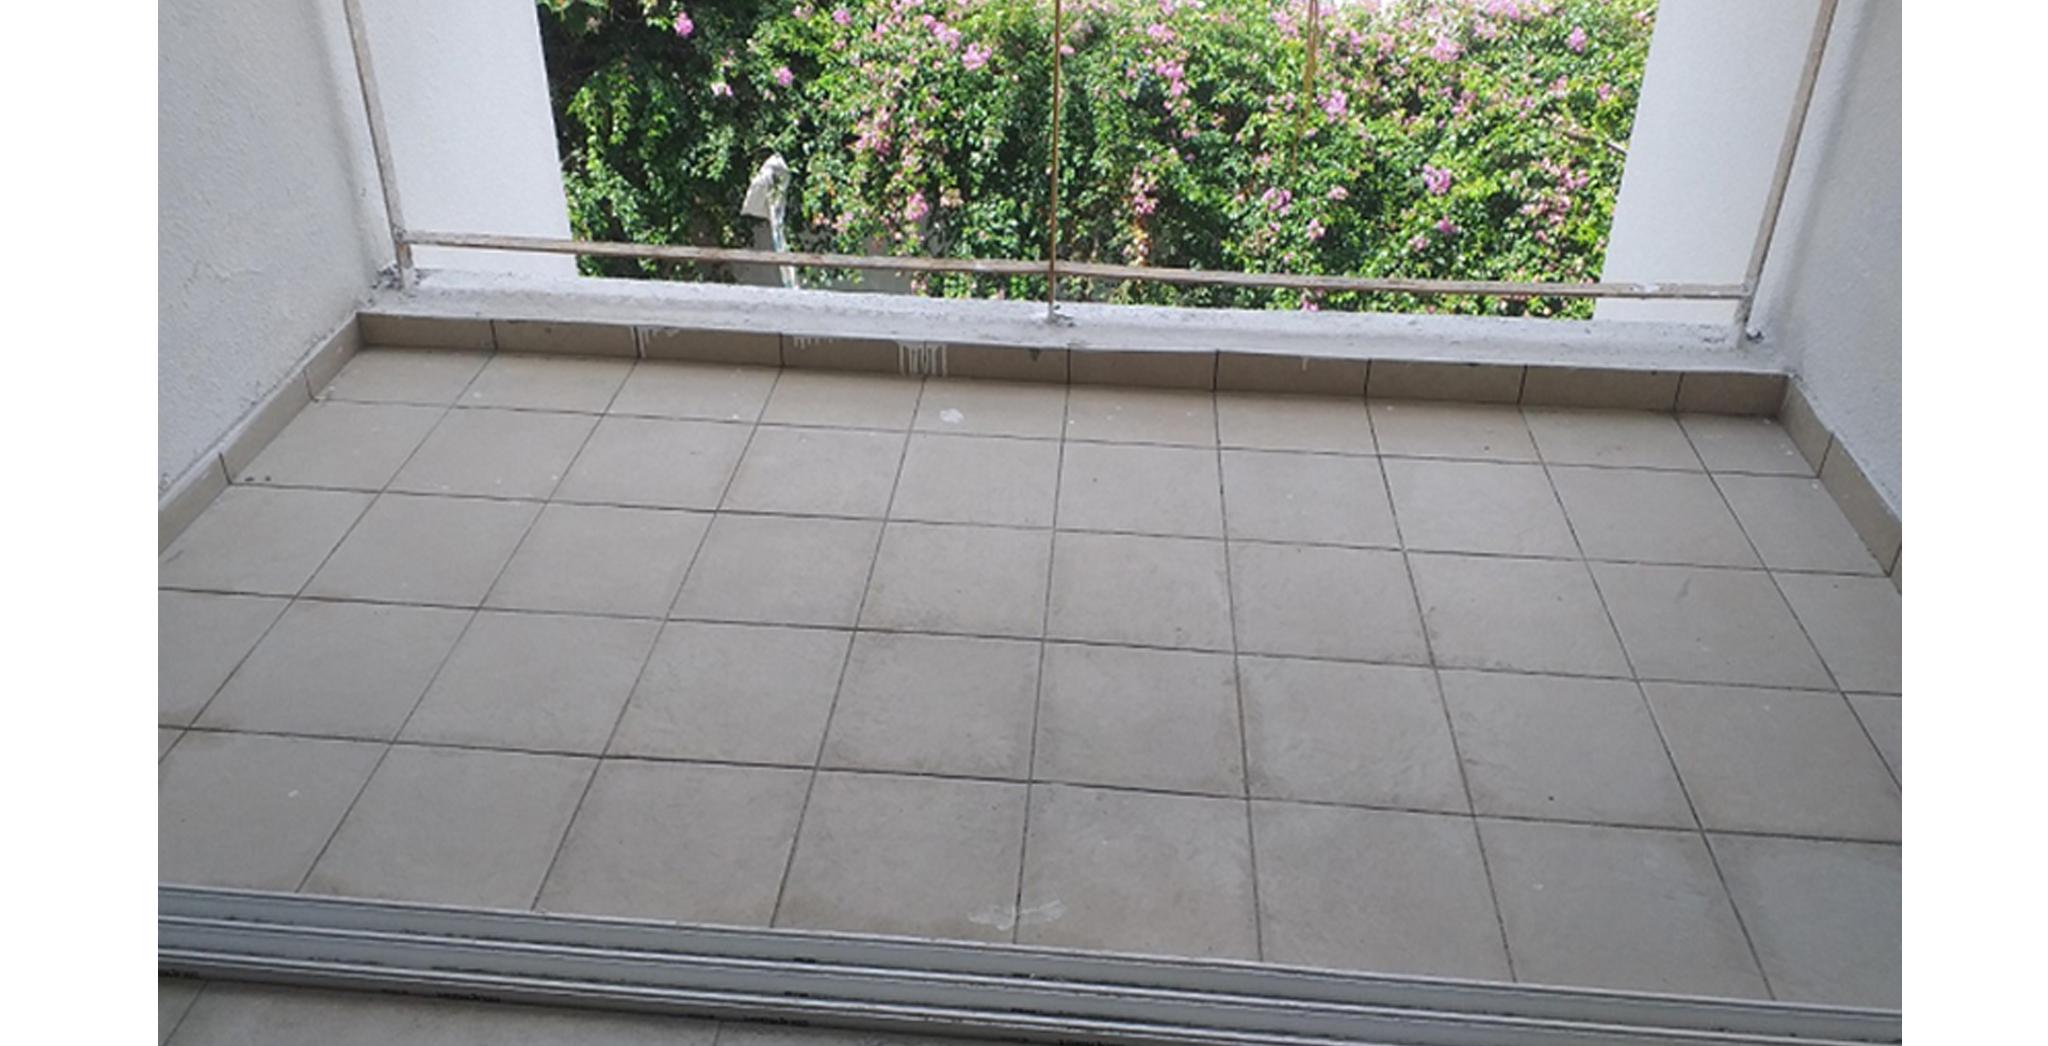 Aug 2021 - Block J, K, L, M, N, P, J, G, E: Balcony tiling works in progress